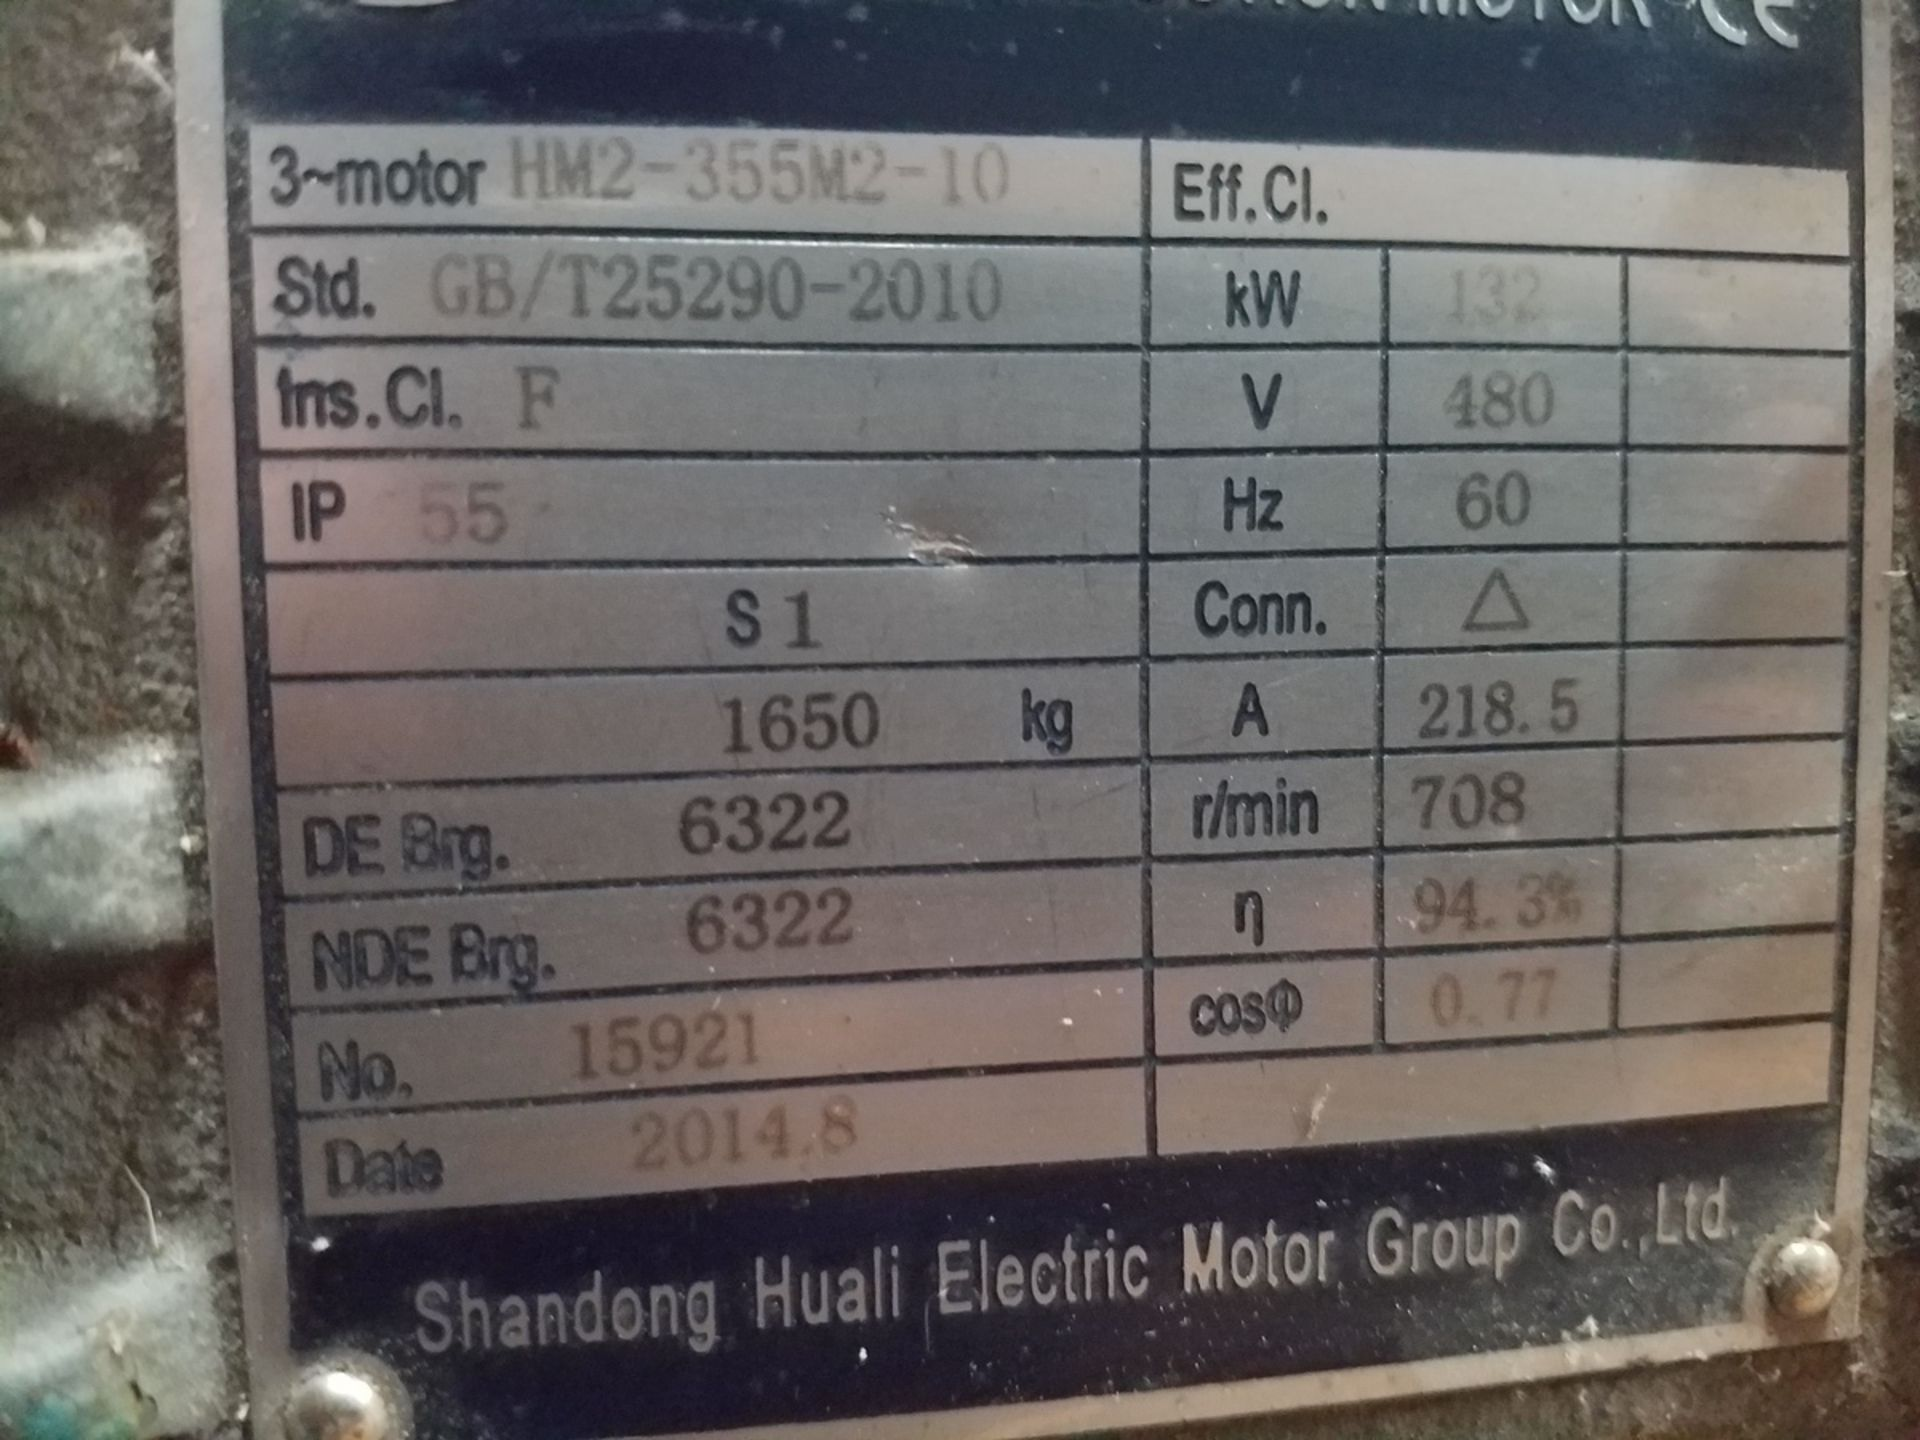 Shandong Huali 132 KW Electric Motor, W/ Riser Platform | Rig Fee: $75 - Image 2 of 3